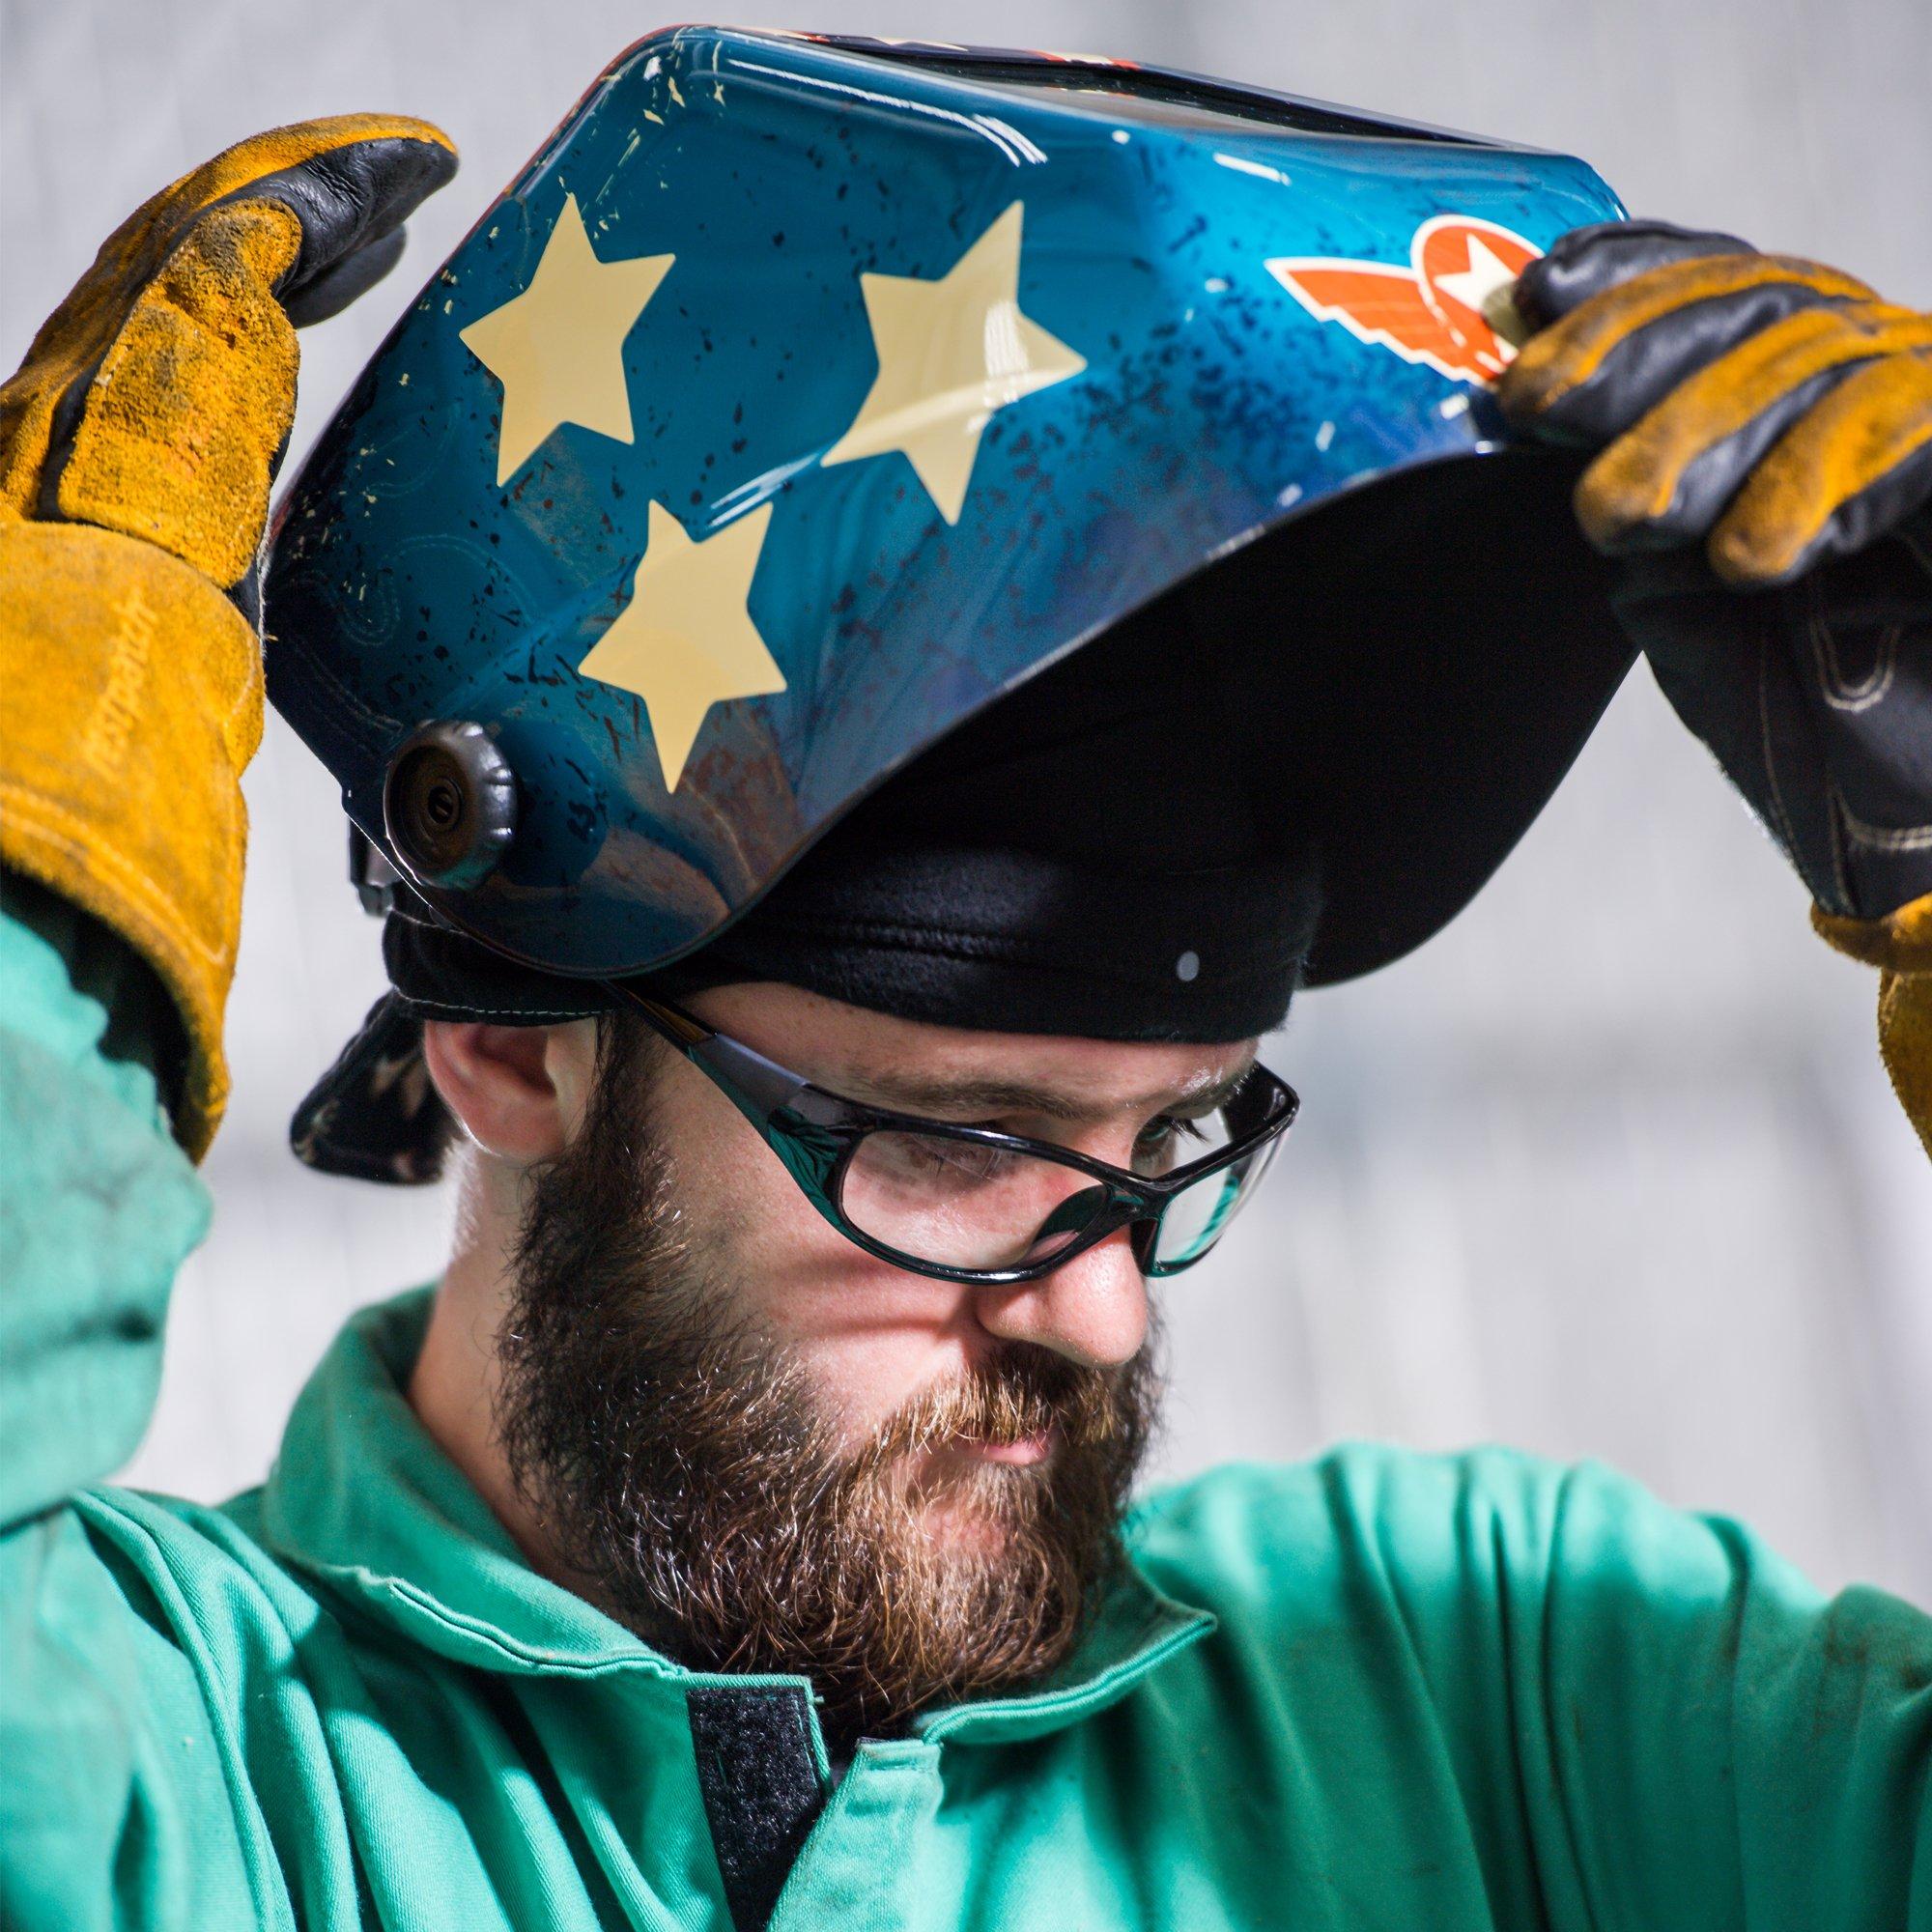 Jackson Safety Insight Variable Auto Darkening Welding Helmet (46101), HLX, 370 Comfortable Headgear, Ultra-Light Shell, Stars & Scars, 1 Helmet by Jackson Safety (Image #6)